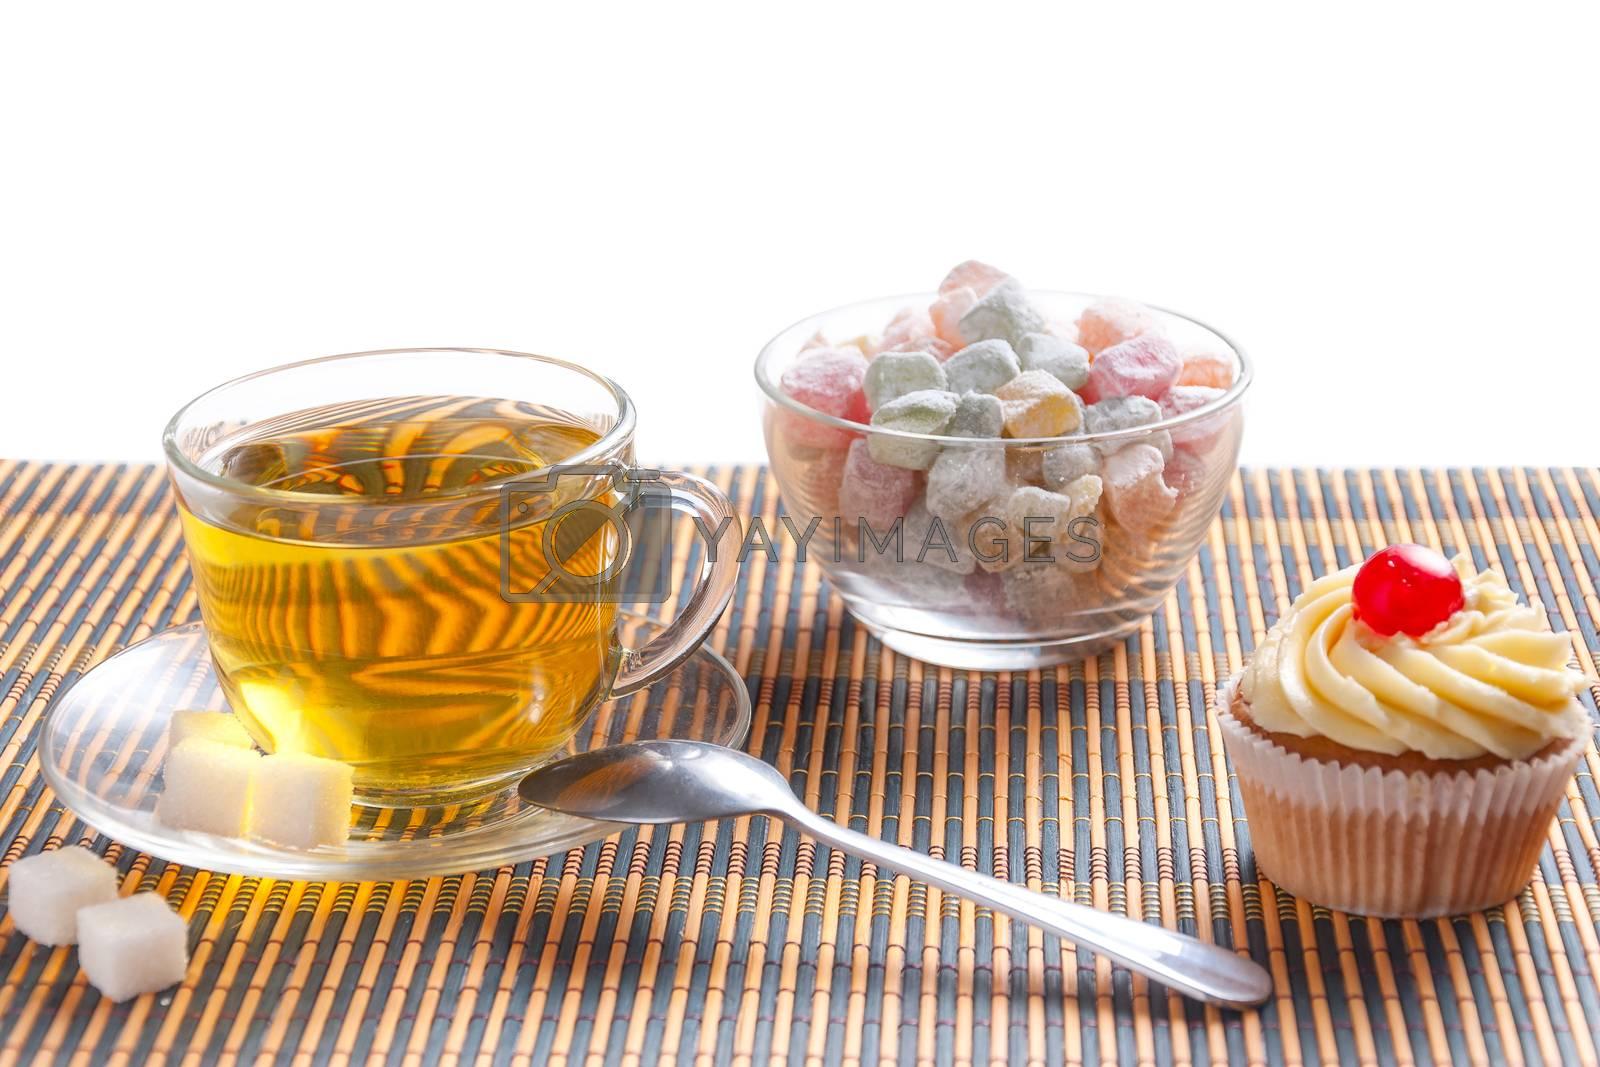 Green tea, fresh cherry muffin, colorful delight and sugar